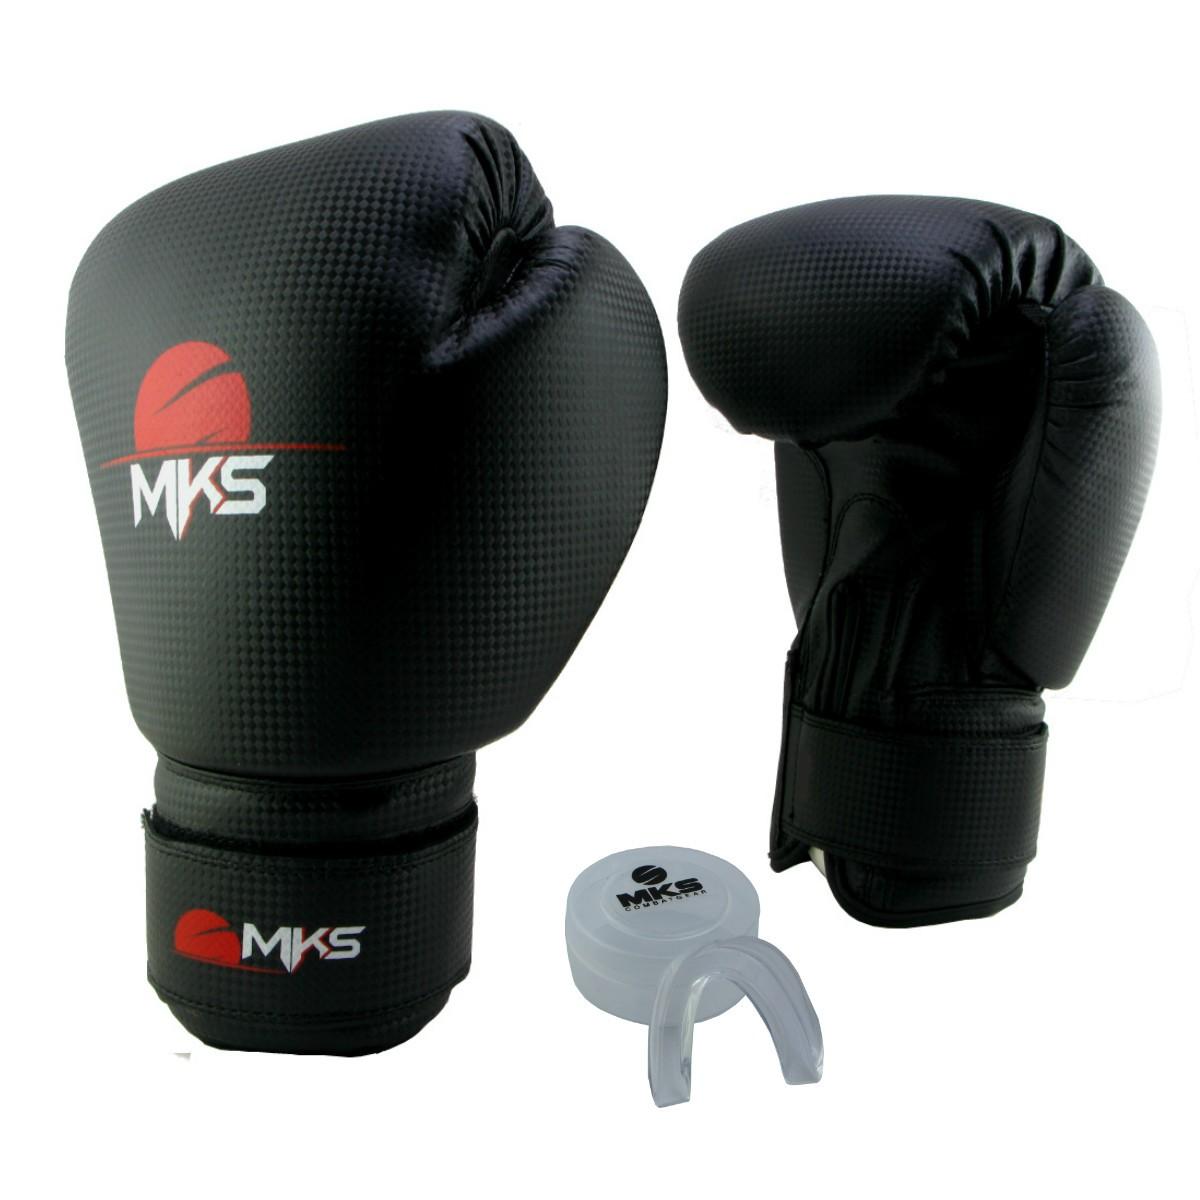 Luva de Boxe Prospect MKS Preta 16oz + Protetor Bucal